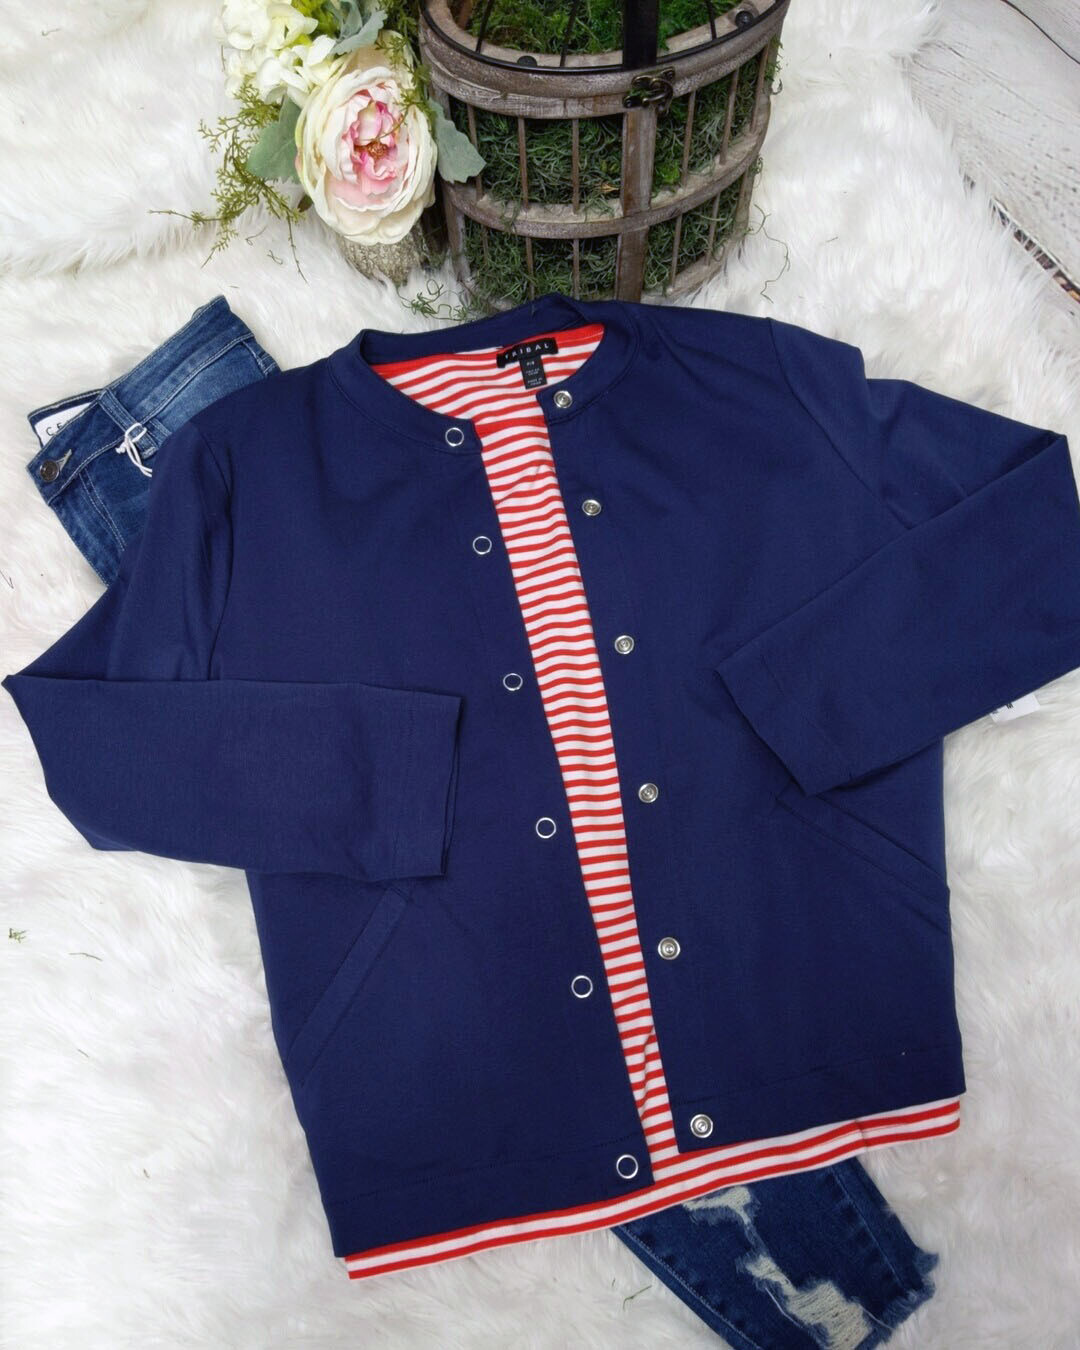 Ariel Jacket by Southern Lady